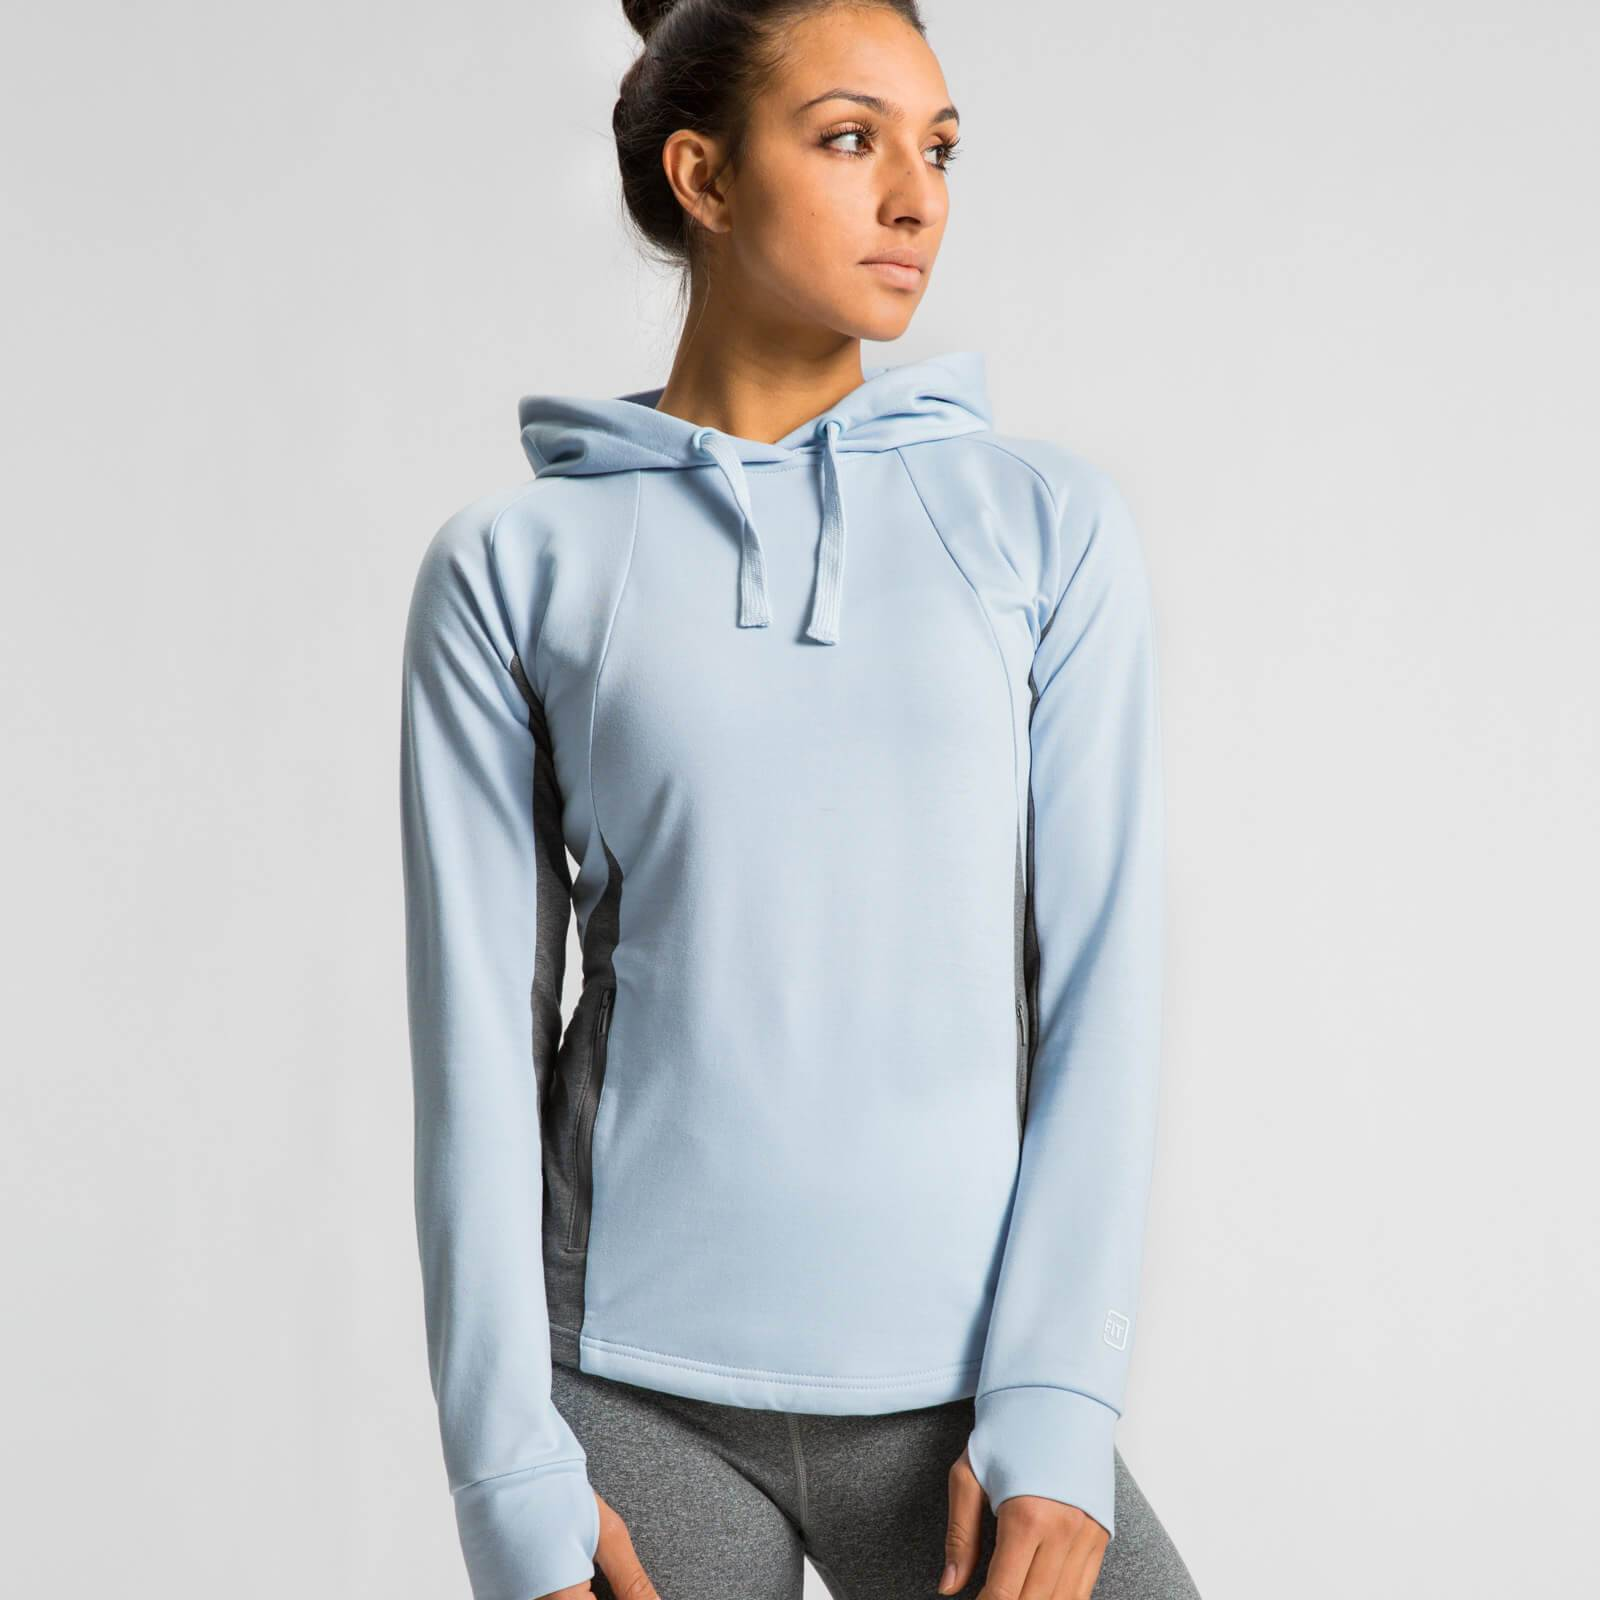 IdealFit Superlite Pullover Hoodie - Light Blue - M - Blue